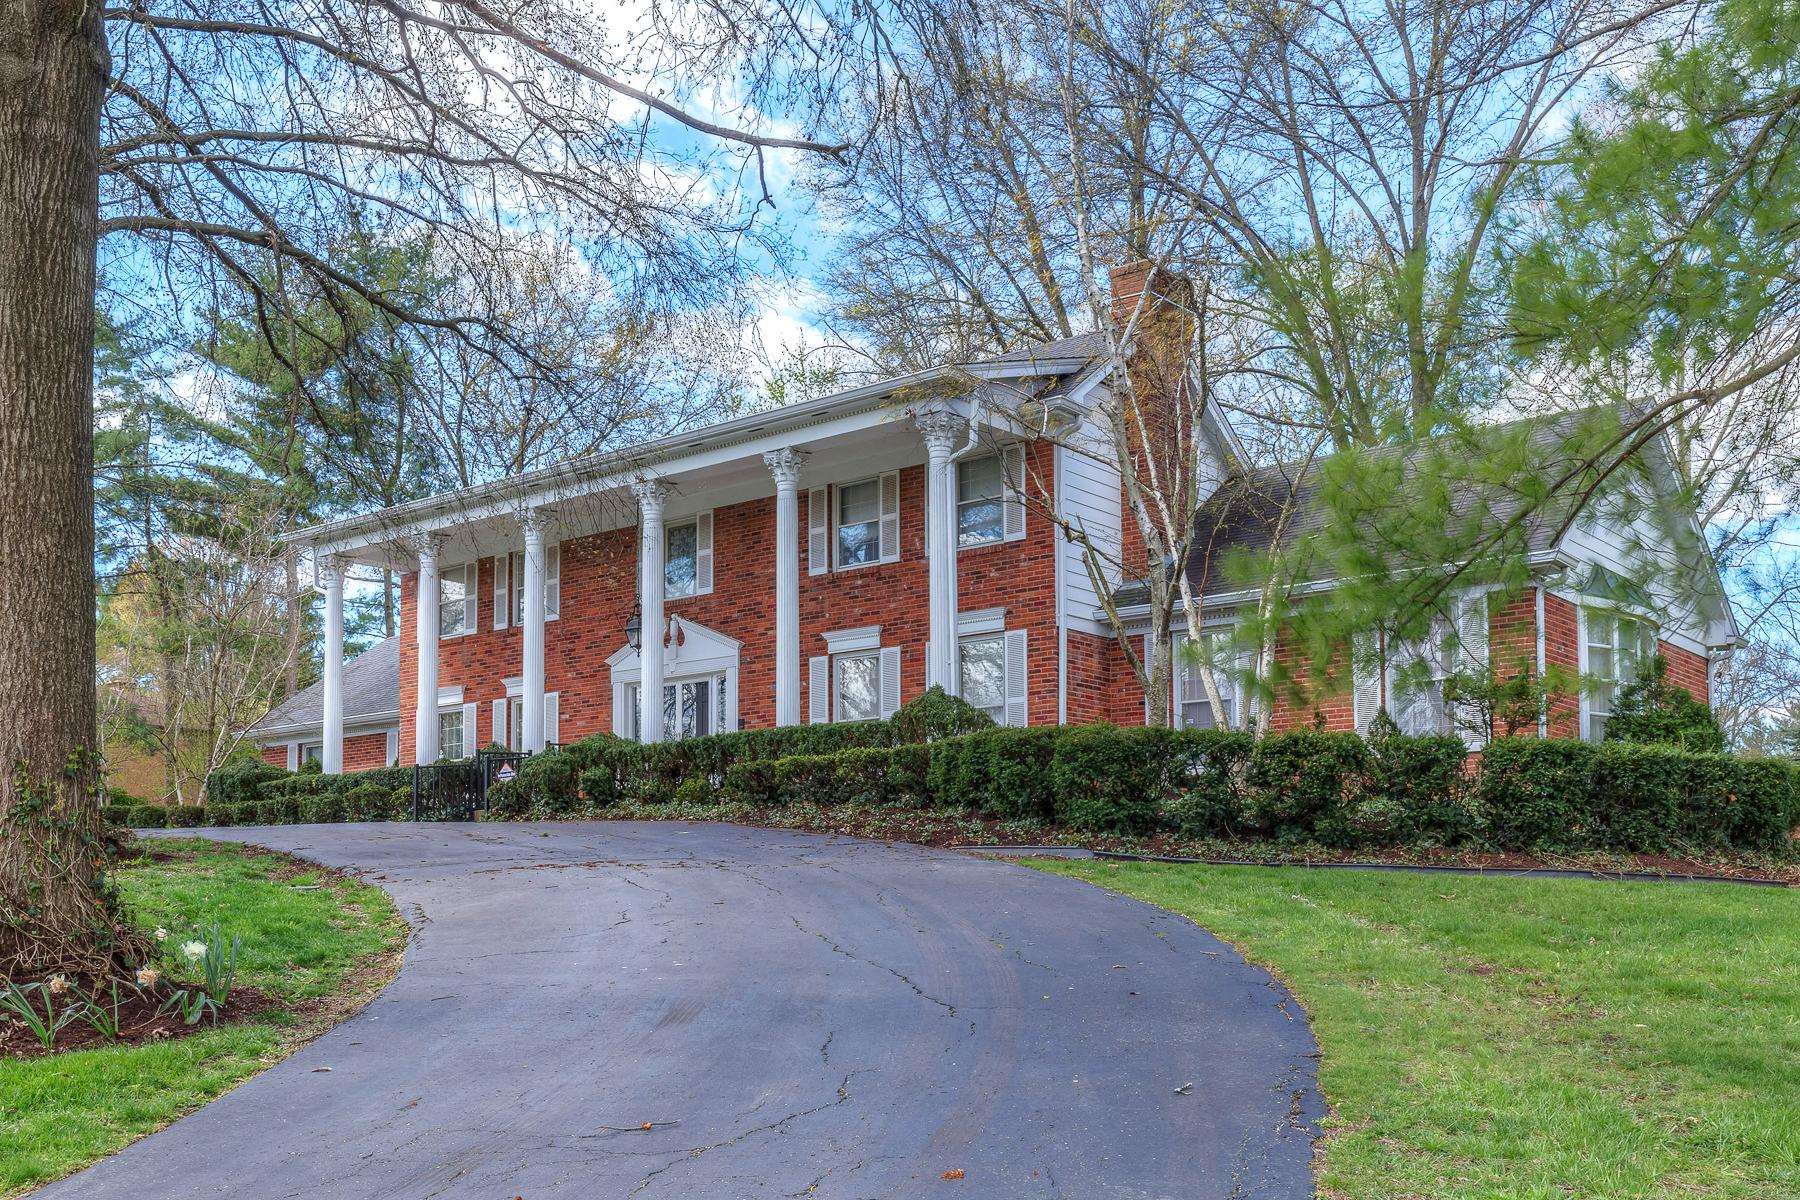 Casa para uma família para Venda às Bryn Wyck 245 Bryn Wyck Town And Country, Missouri, 63141 Estados Unidos